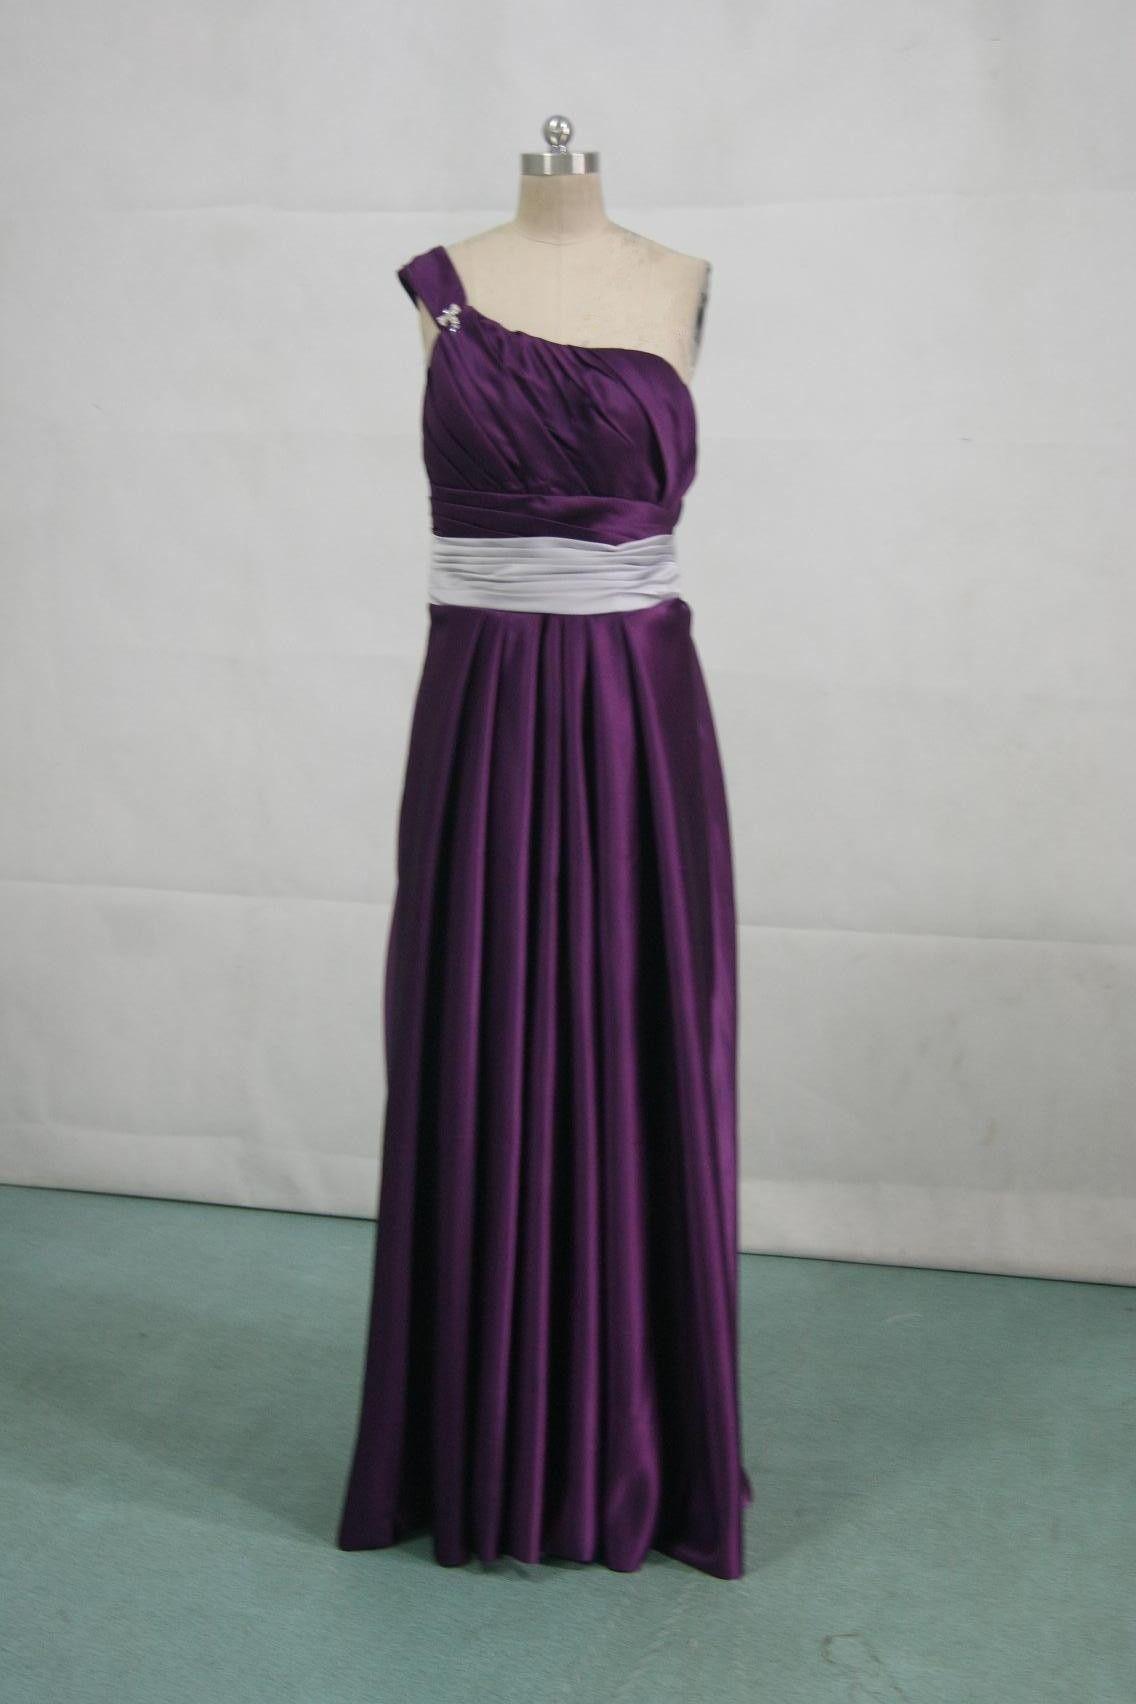 Silver Bridesmaid Dresses Grape And Dress